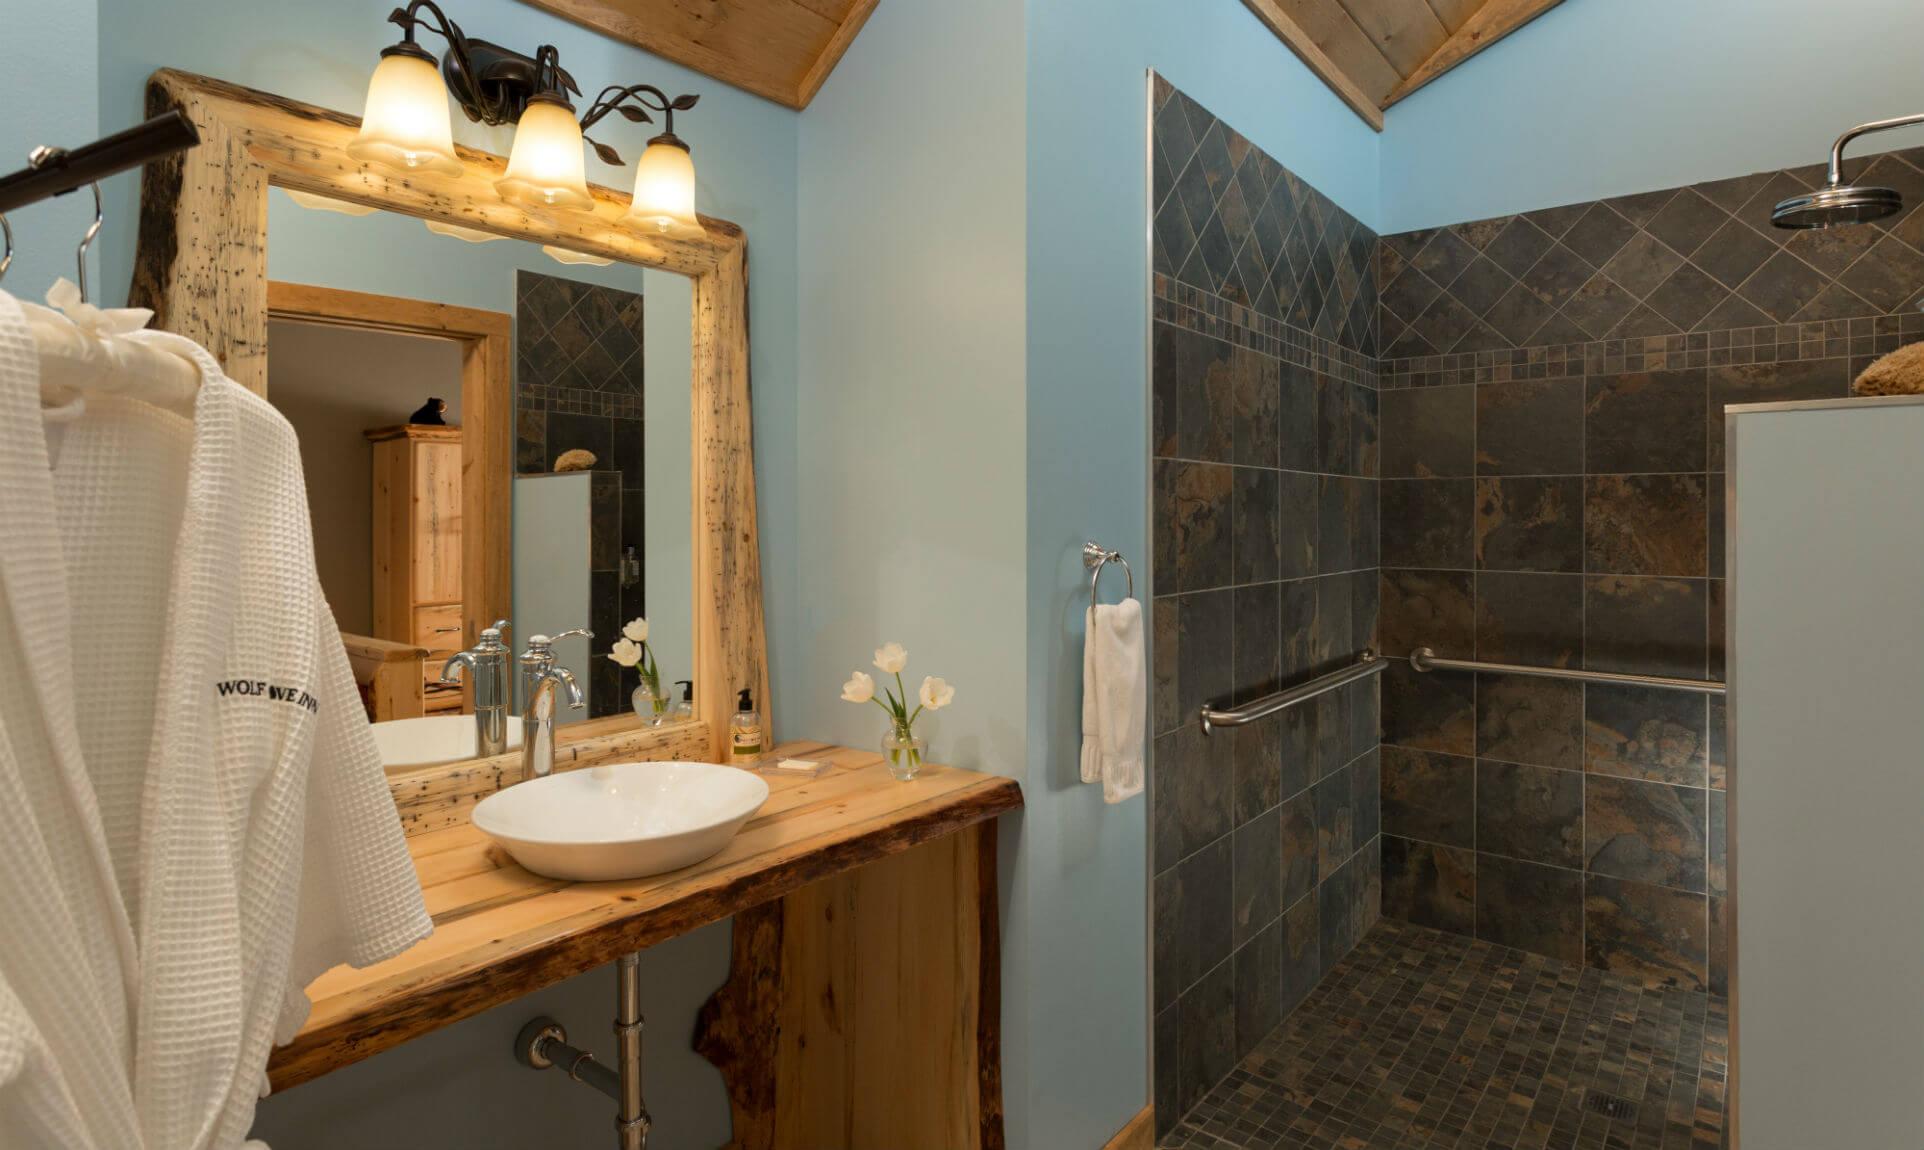 Granite shower and wooden sink in cabin bathroom